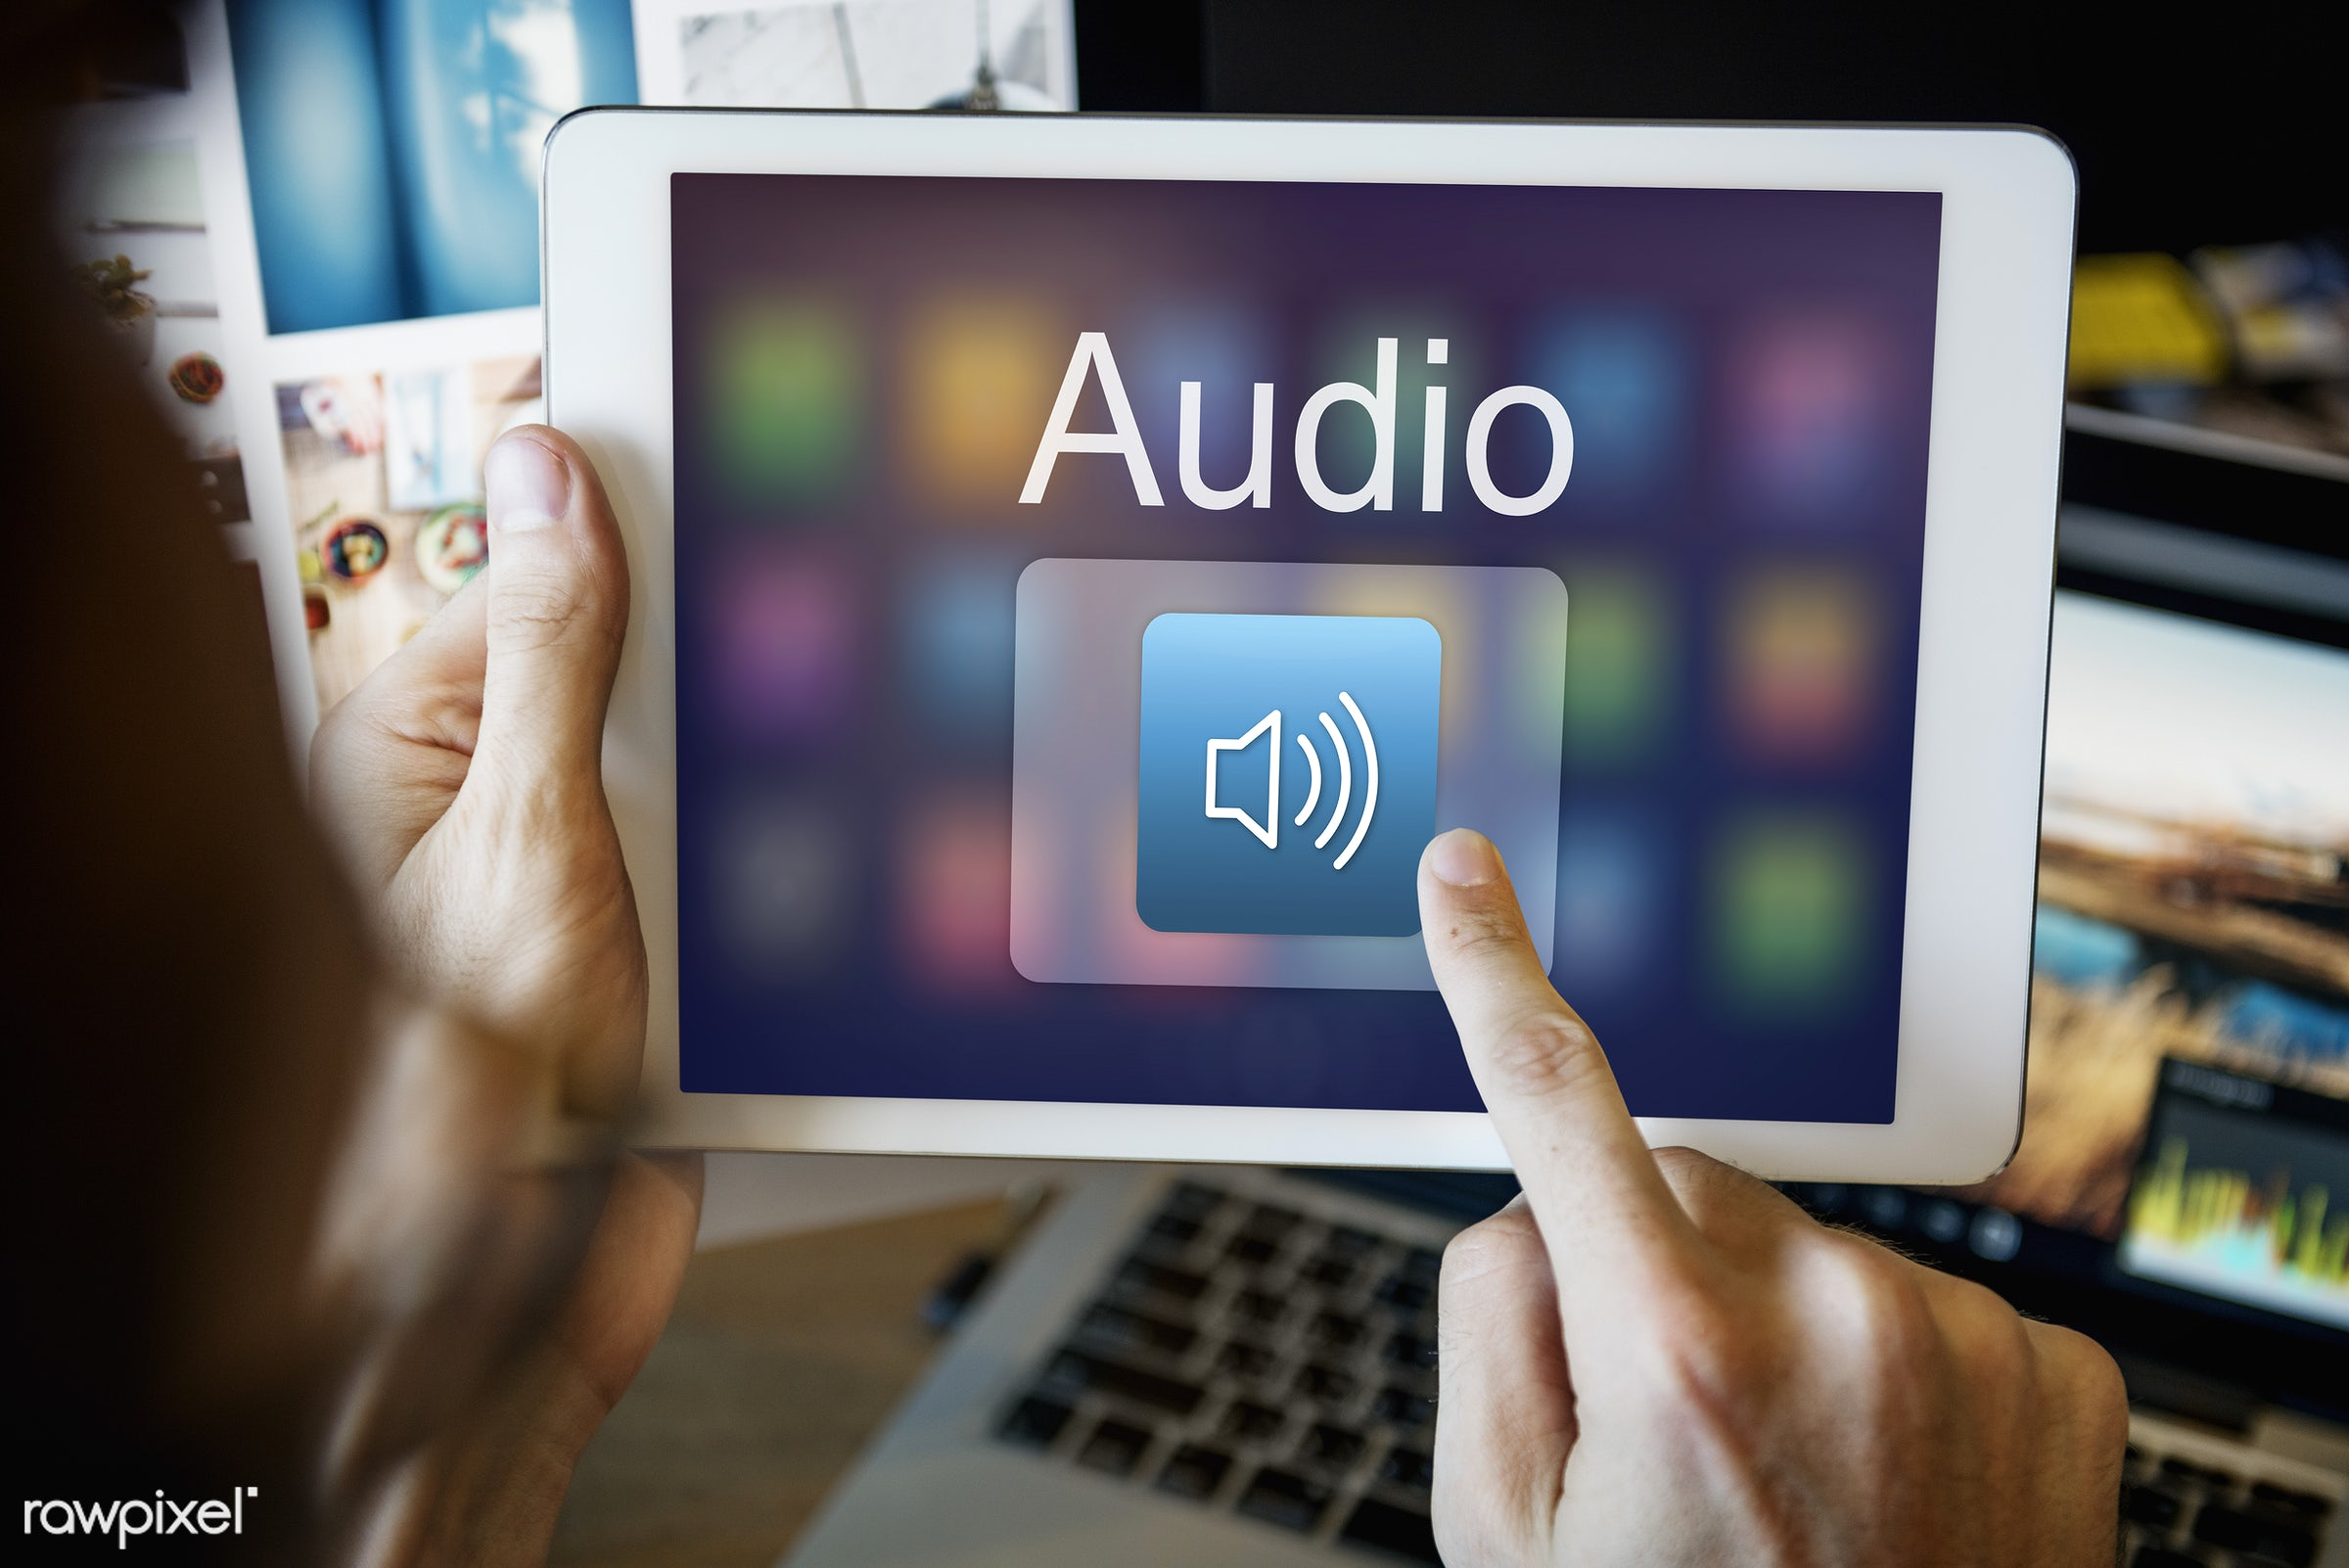 application, audio, broadcast, browsing, connect, connection, creative occupation, desk, digital, digital media, digital...